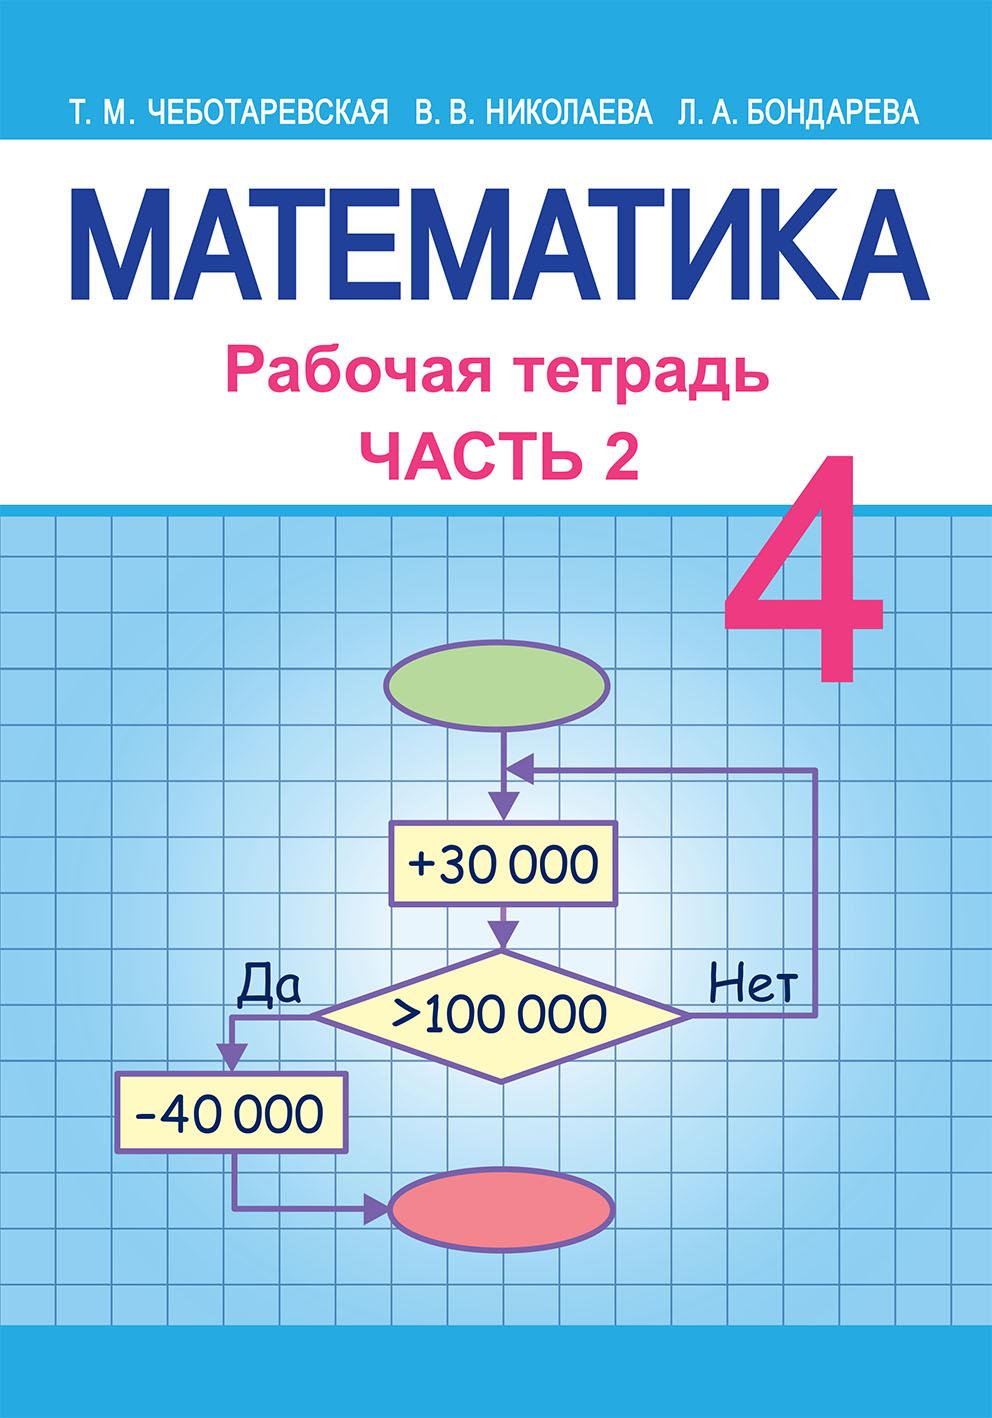 Математика, 4 кл. Рабочая тетрадь № 2